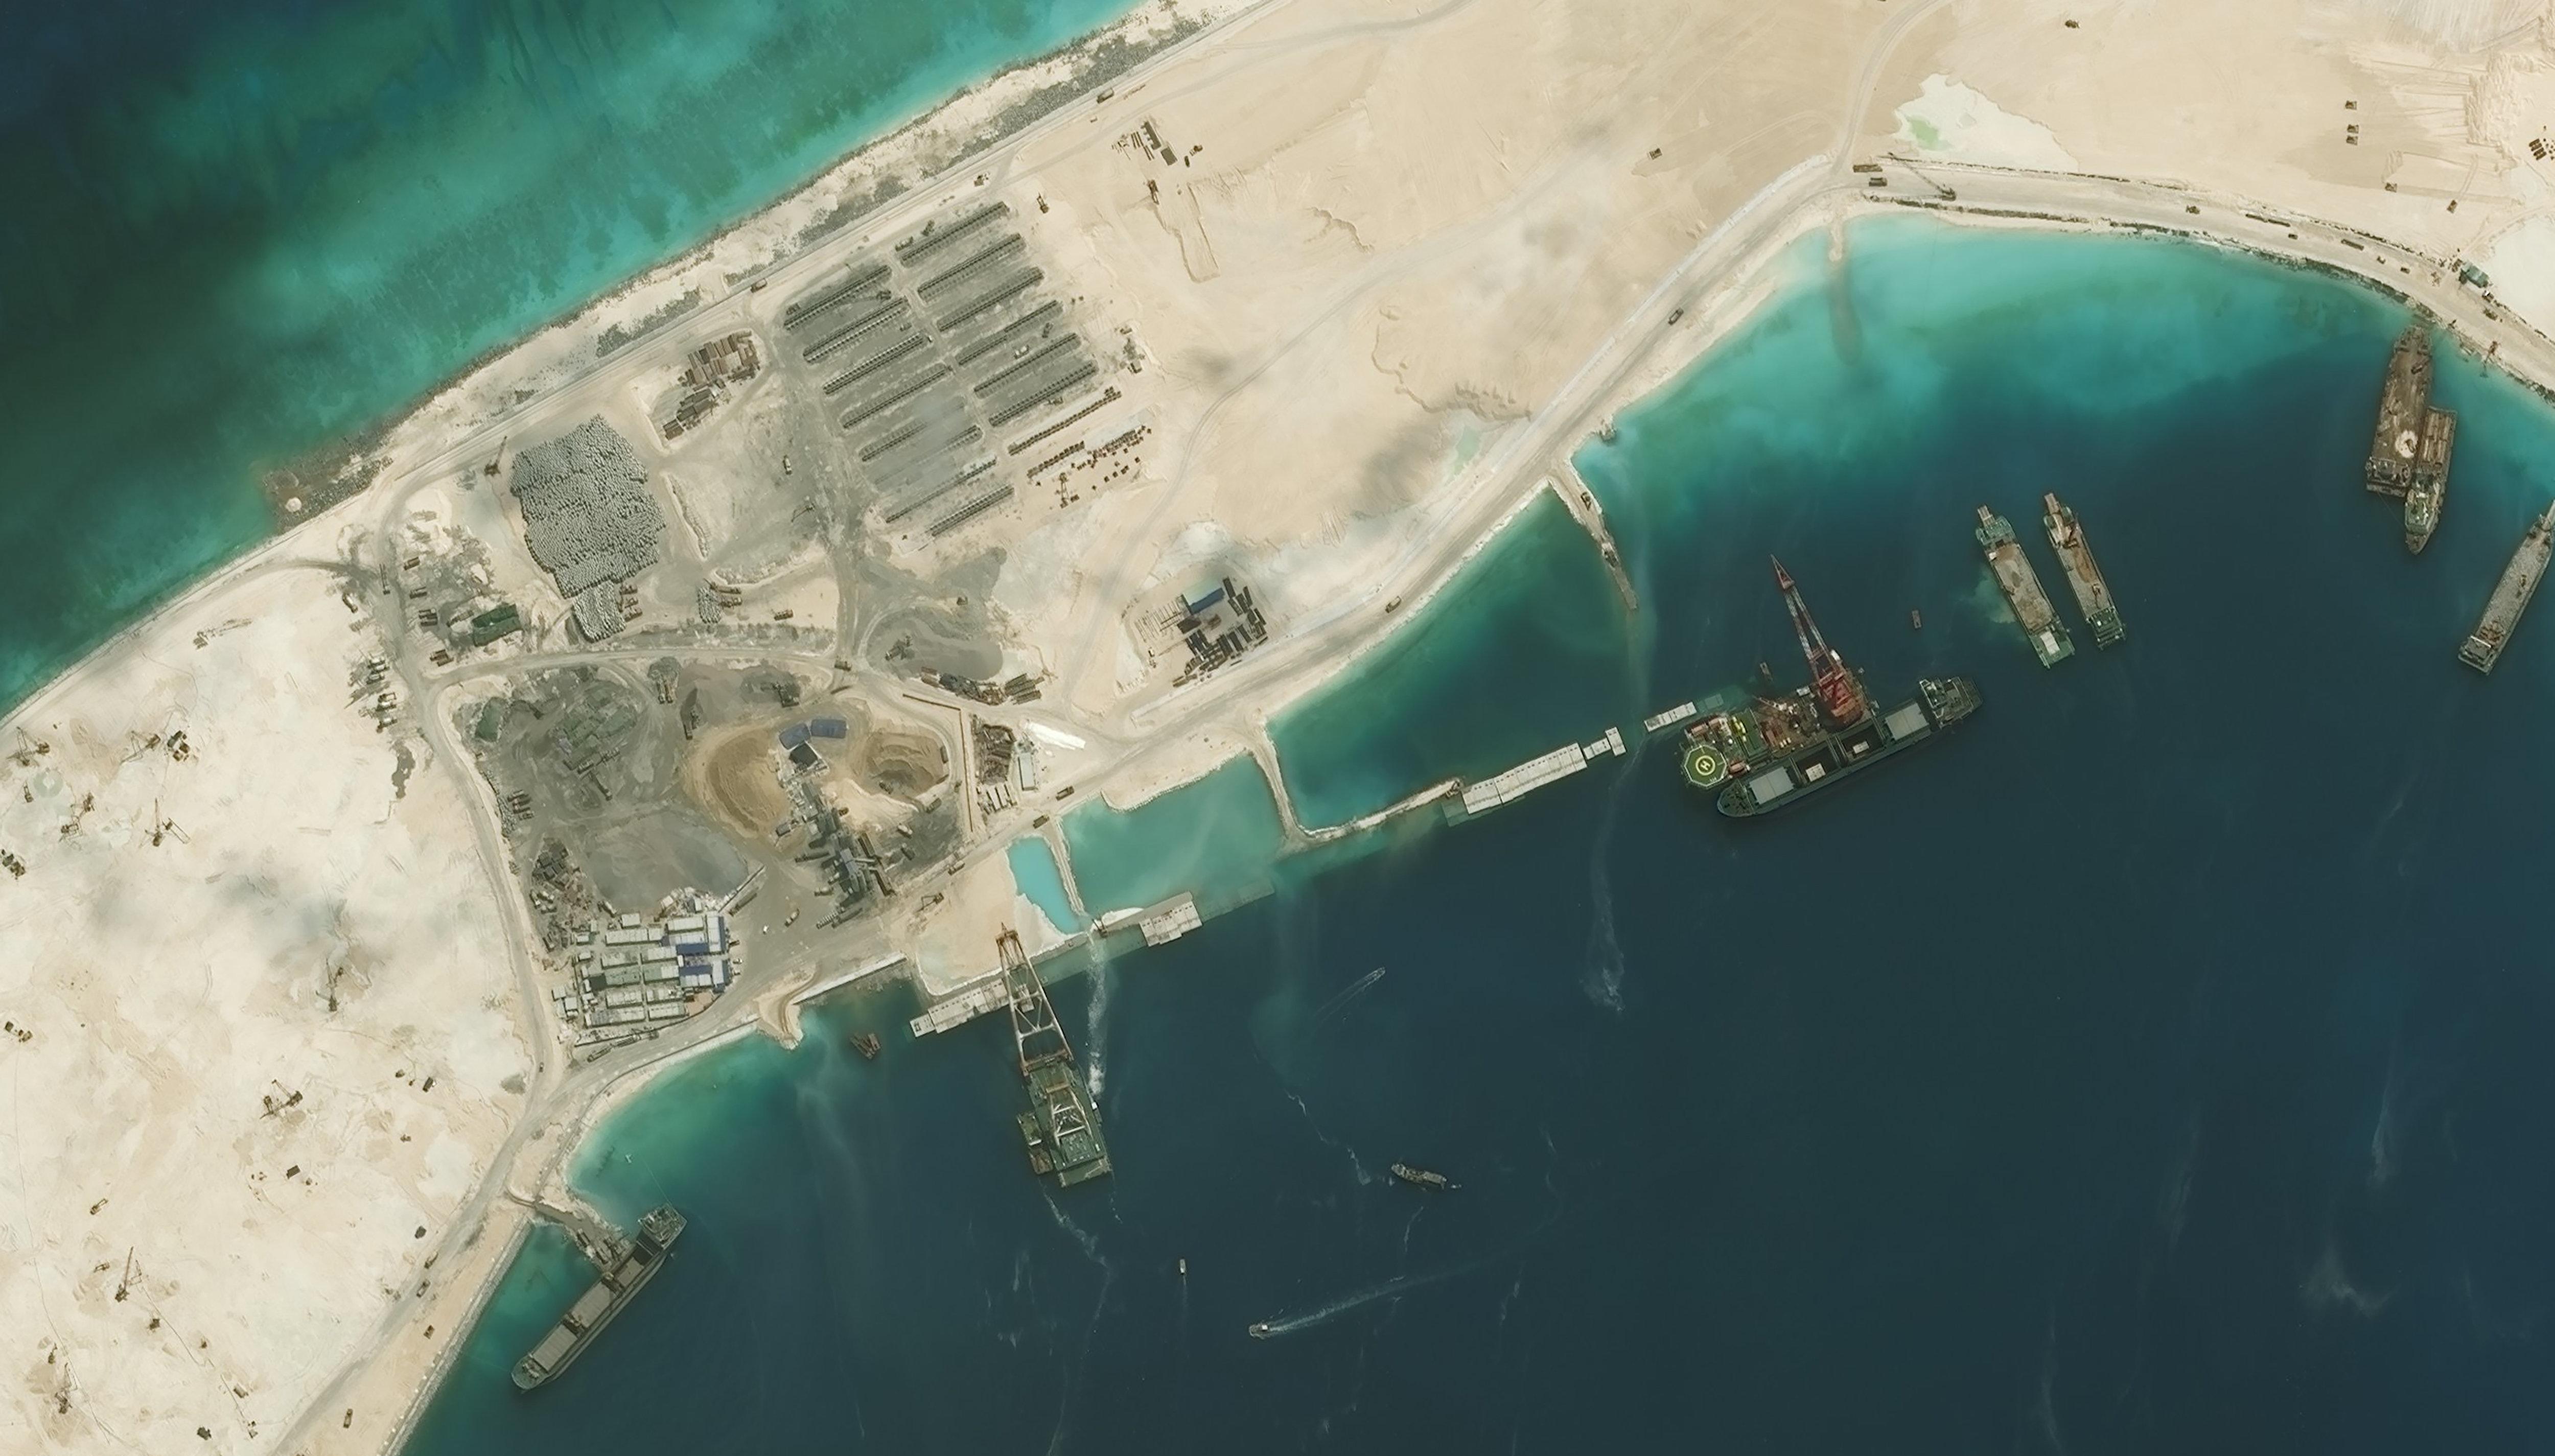 SUBI REEF, SOUTH CHINA SEA - AUGUST 1, 2015:  DigitalGlobe imagery of the Subi Reef in the South China Sea, a part of the Spratly Islands group.  Close up image 2 of 2.  Photo DigitalGlobe via Getty Images.